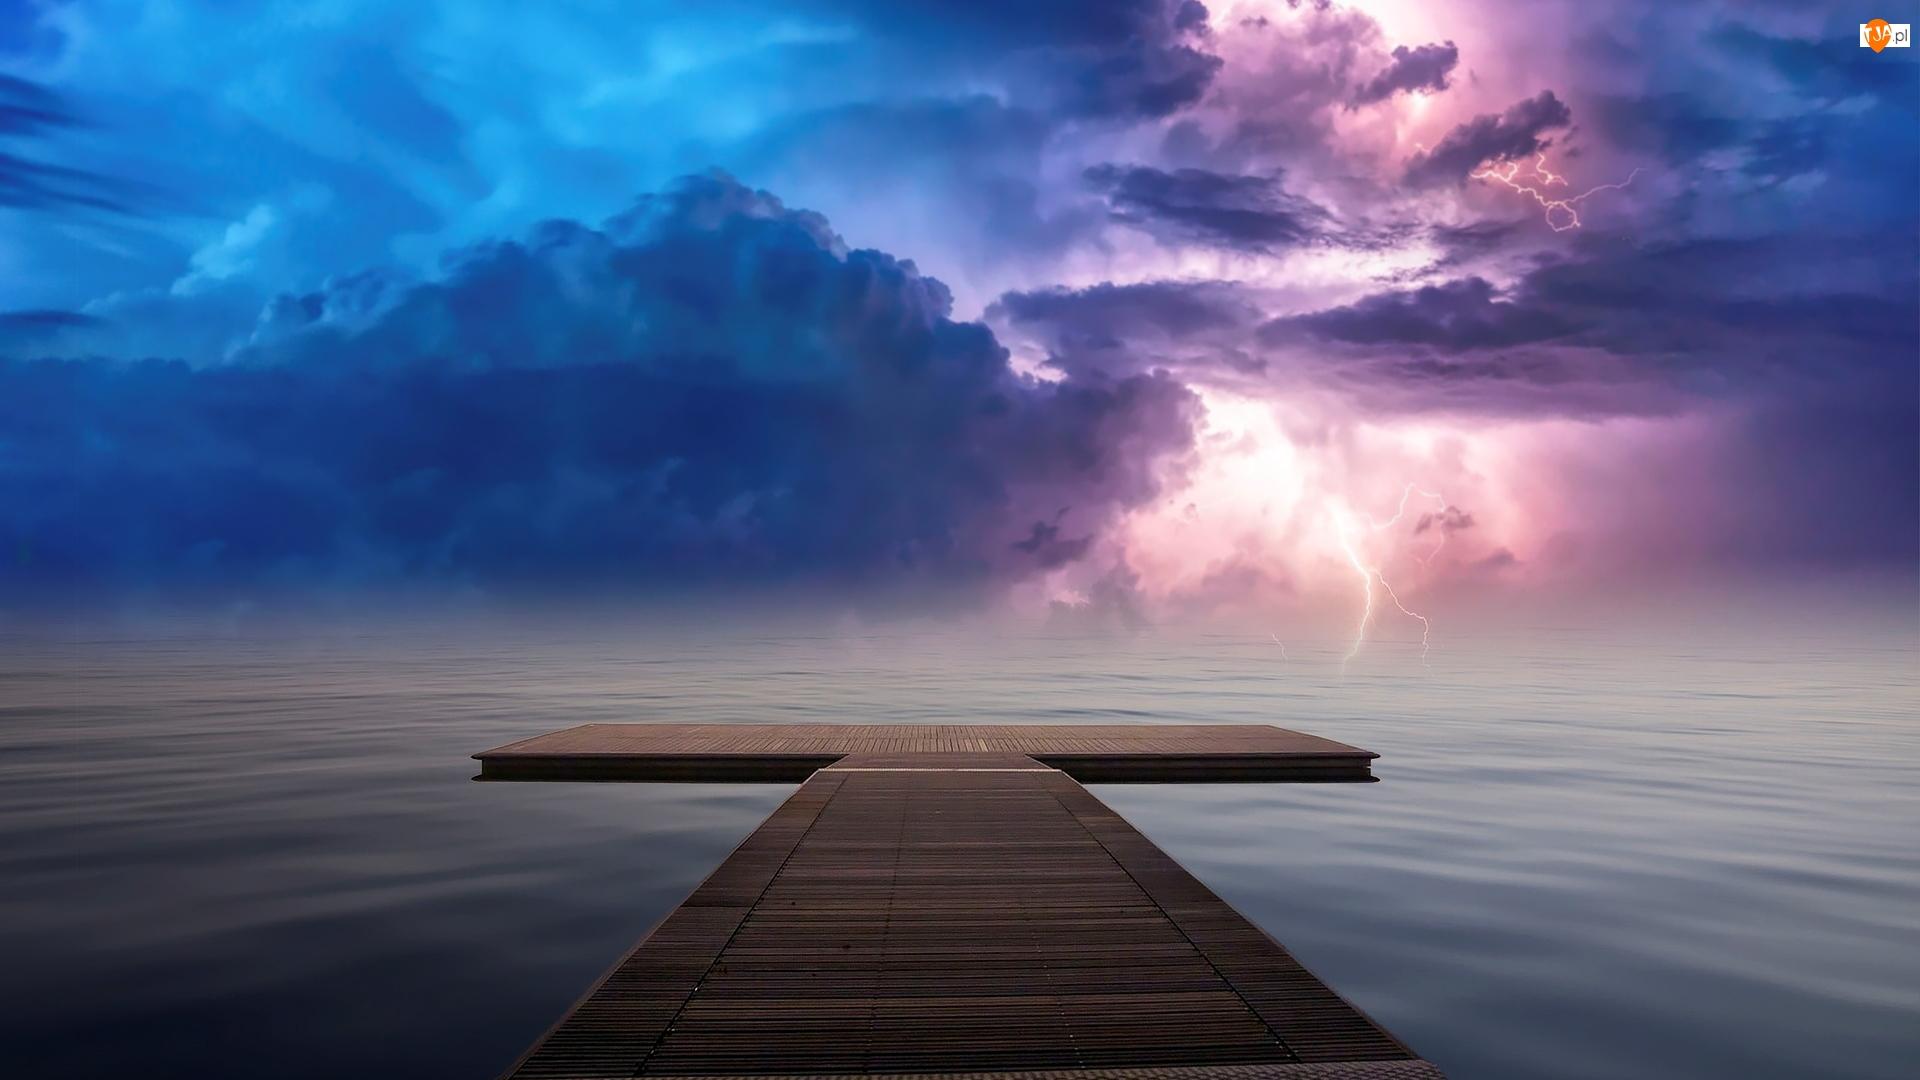 Pomost, Morze, Chmury, 2D, Niebo, Pioruny